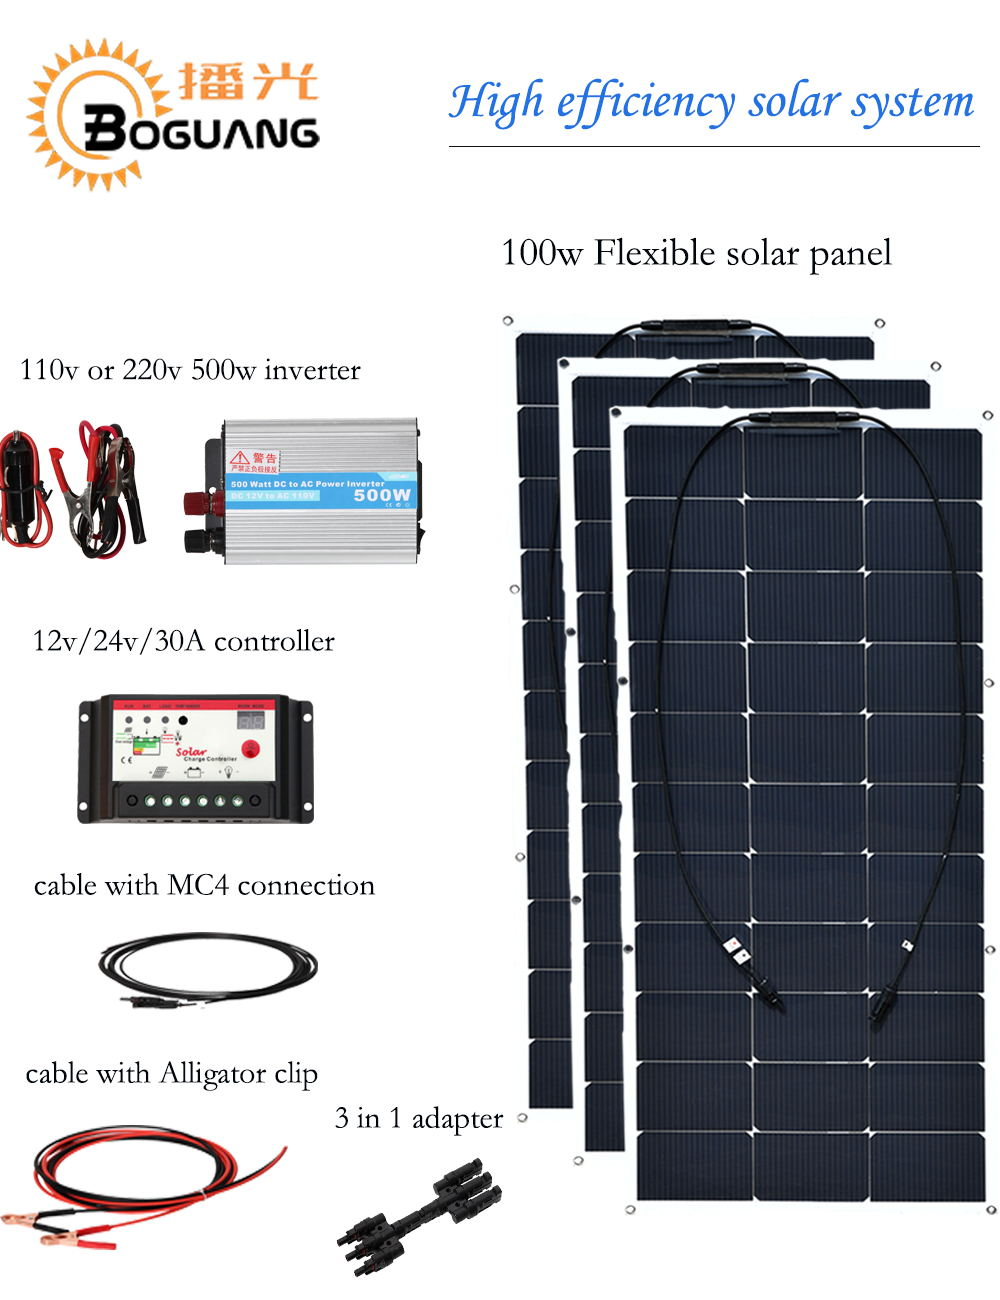 Boguang 300w solar system 100w flexible solar panel cell module 110v 220v 500w inverter 12v/24v 30A controller MC4 connector boguang 500w semi flexible solar panel solar system efficient cell diy kit module 50a mppt controller adapter mc4 connector